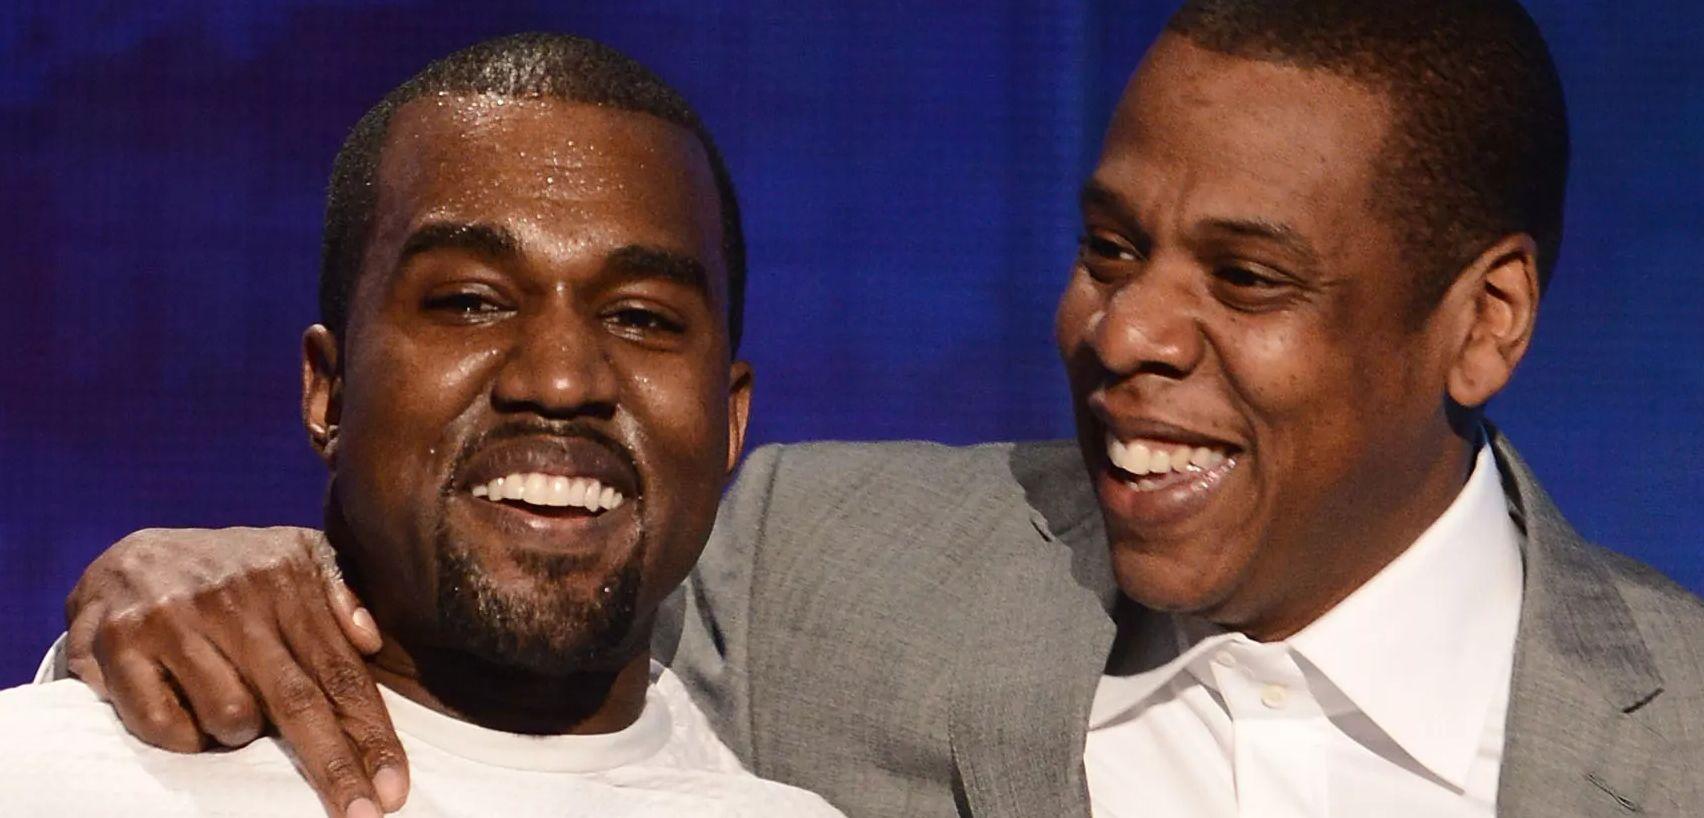 Kanye West & Jay-Z on stage